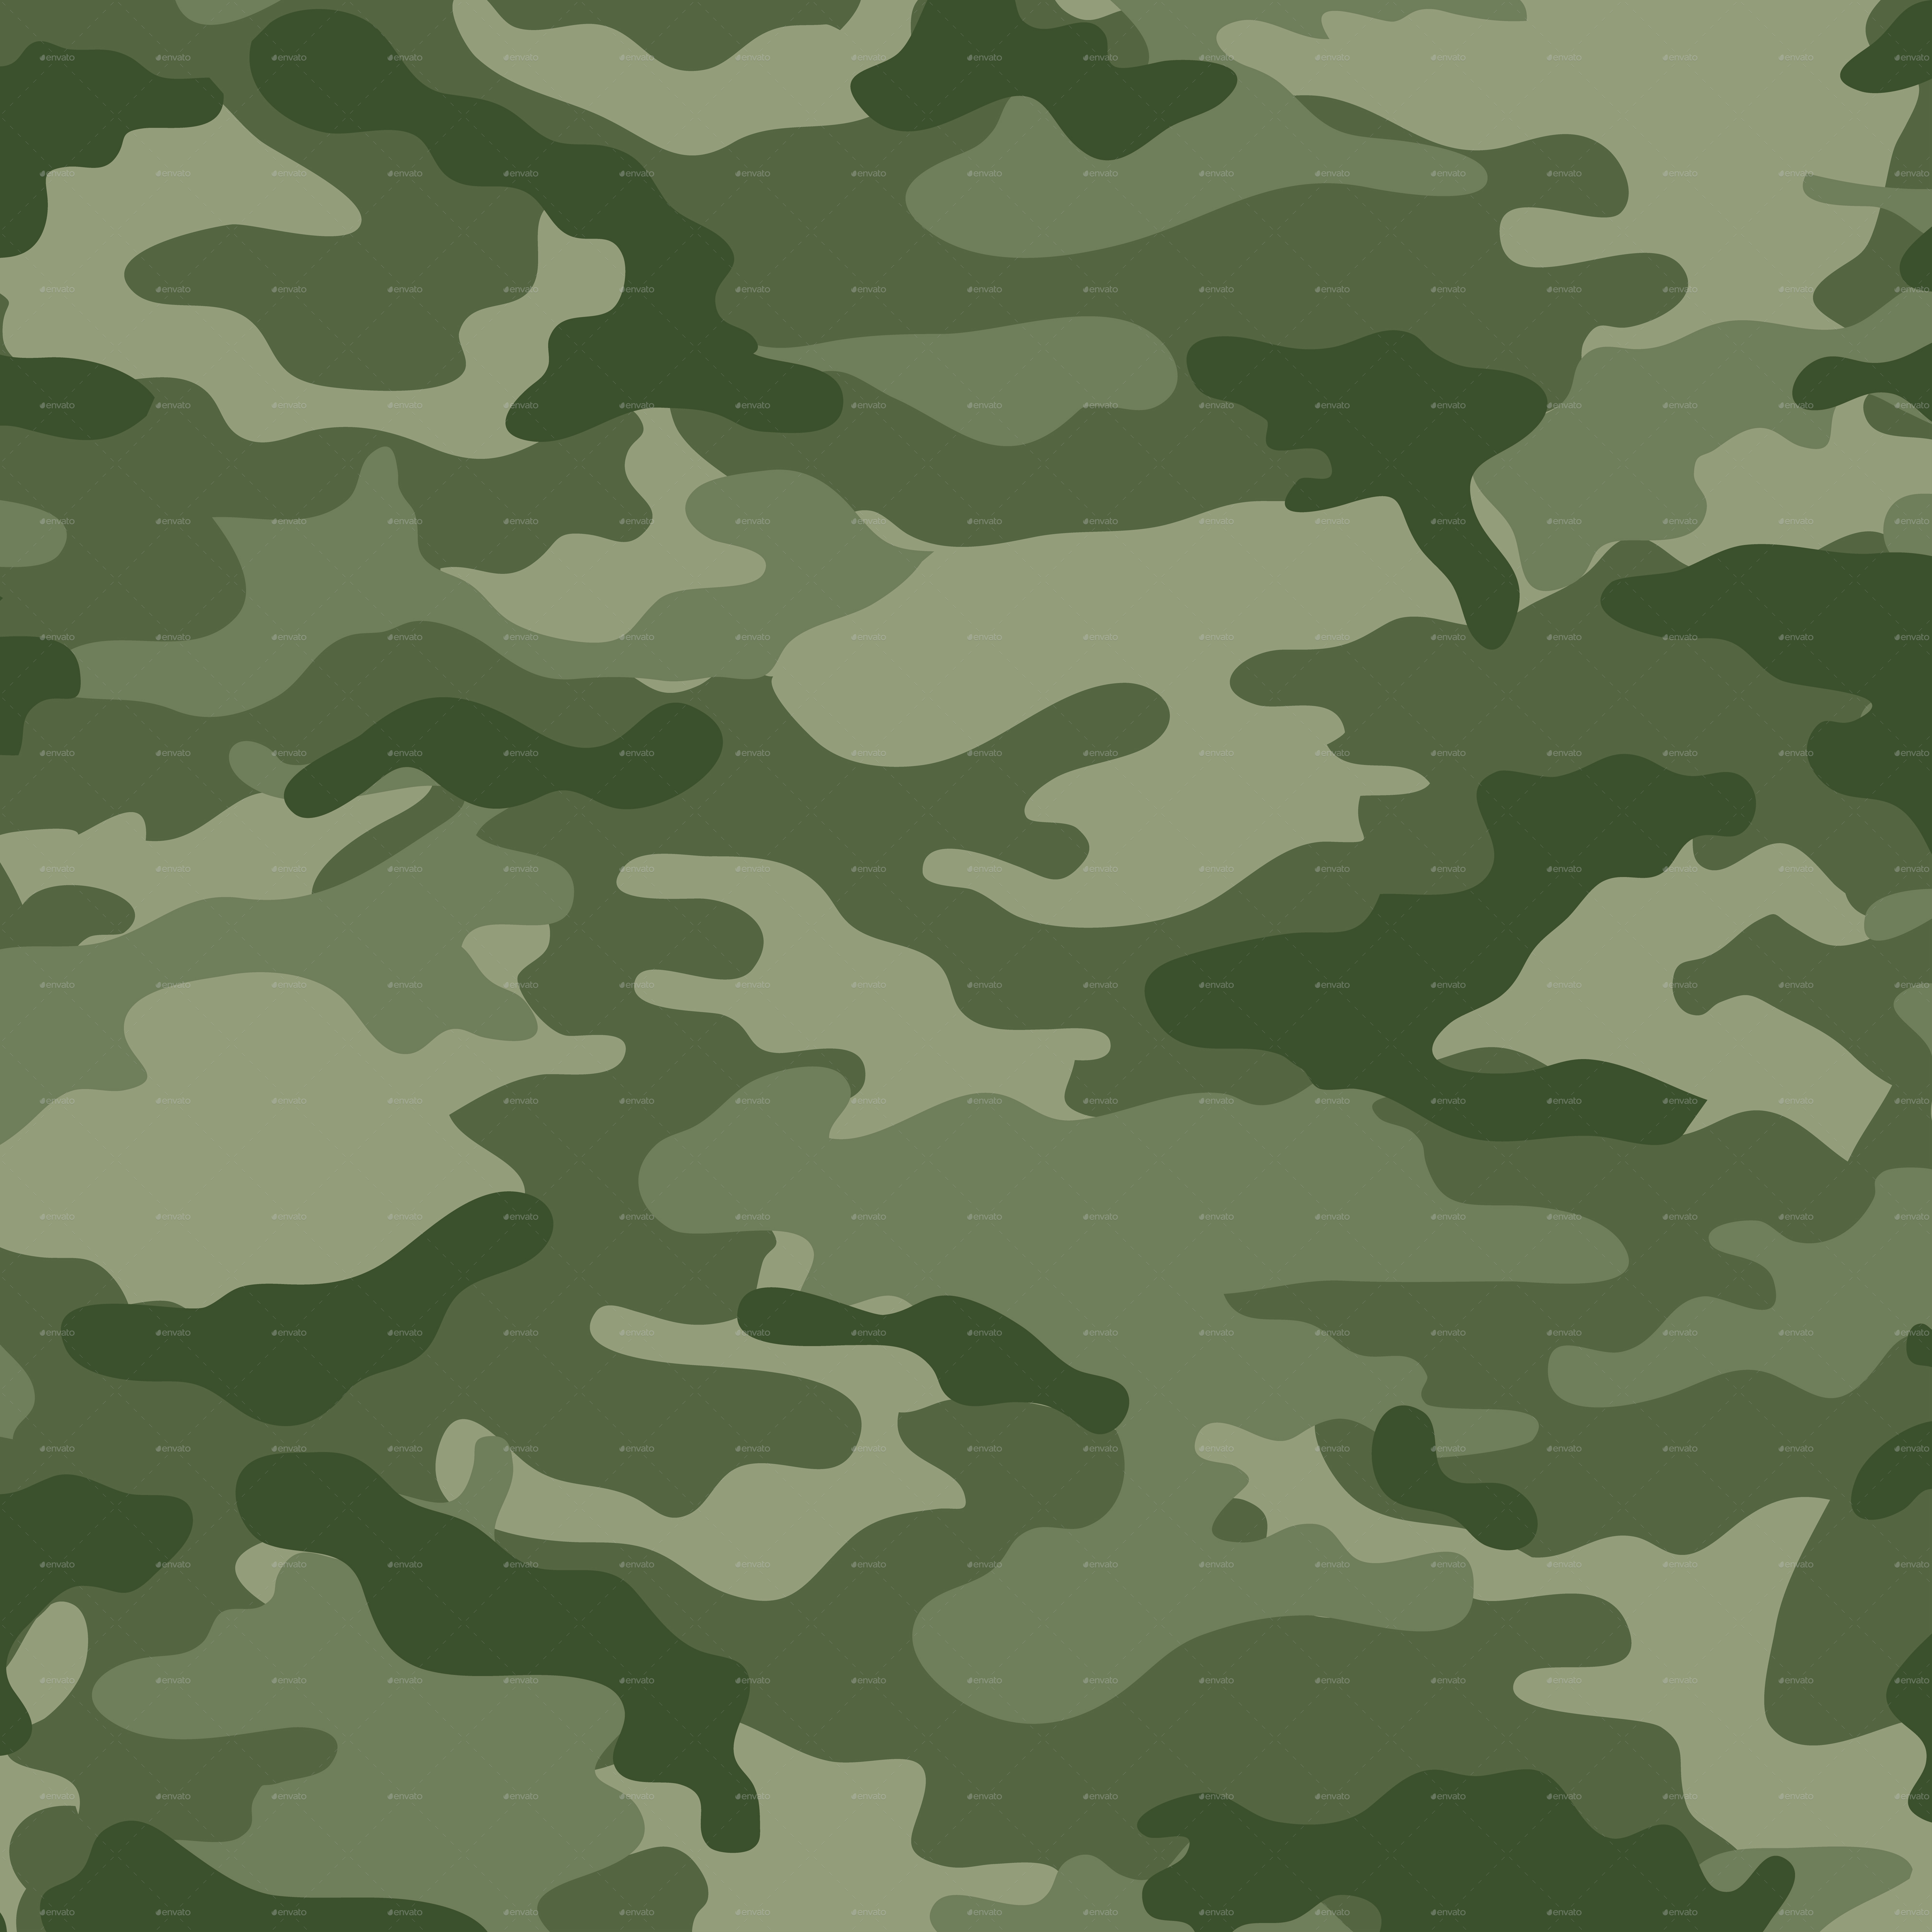 50 military texture backgrounds by haikhow graphicriver 50 military texture backgrounds backgrounds graphics 01imageg toneelgroepblik Images